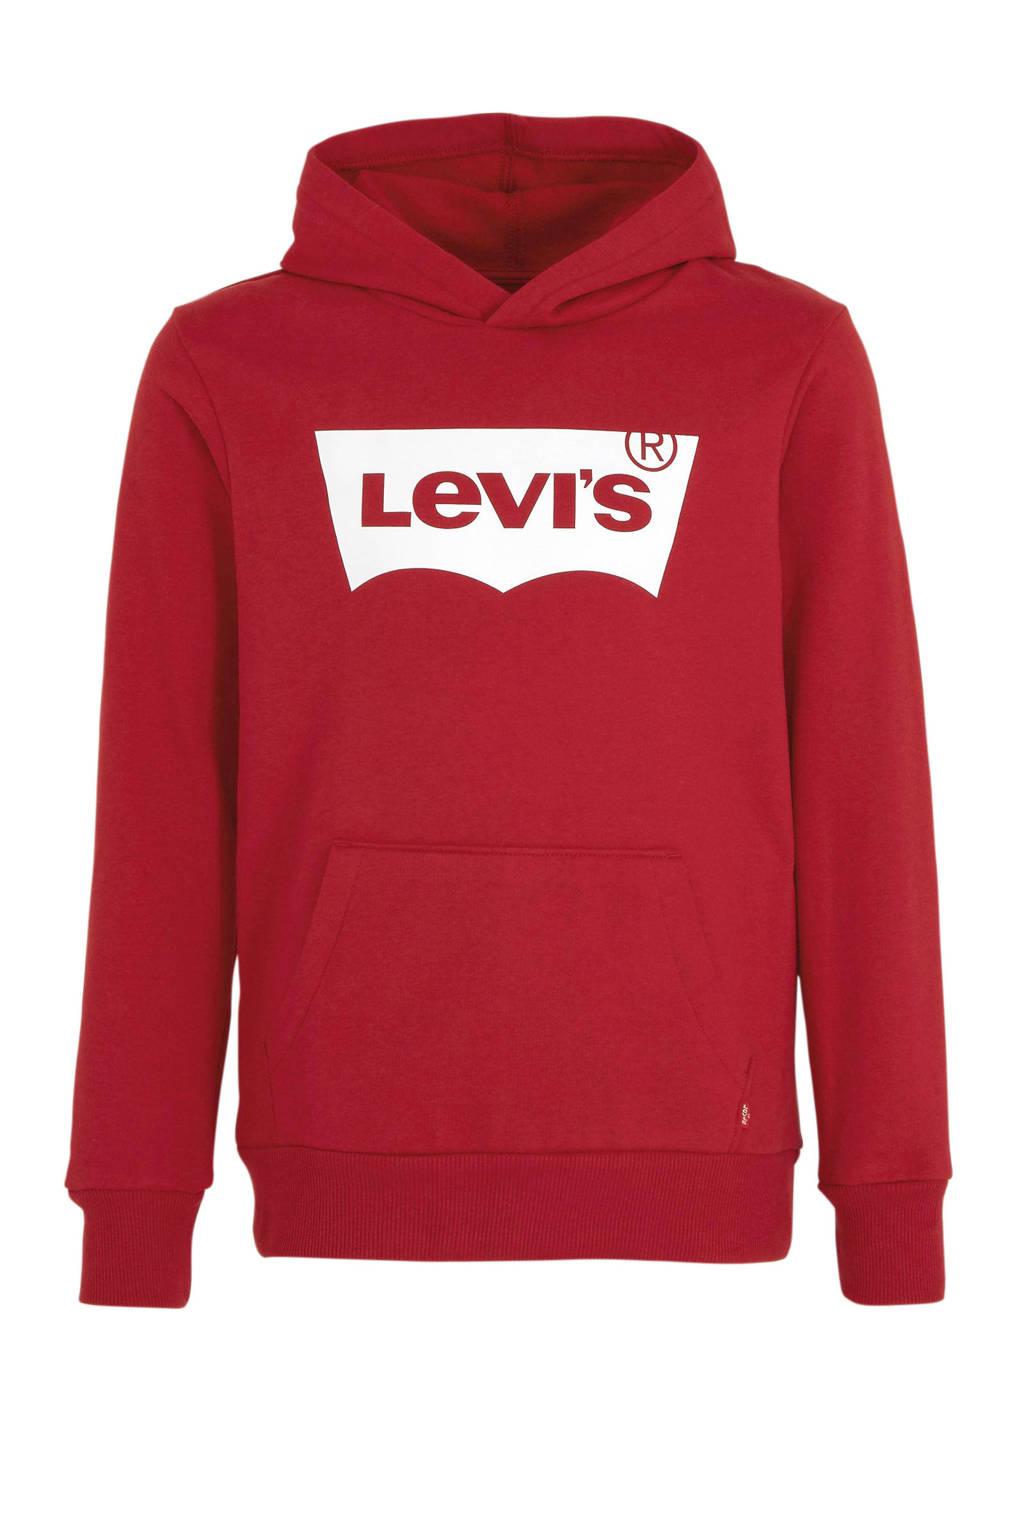 Levi's Kids hoodie met logo rood/wit, Rood/wit